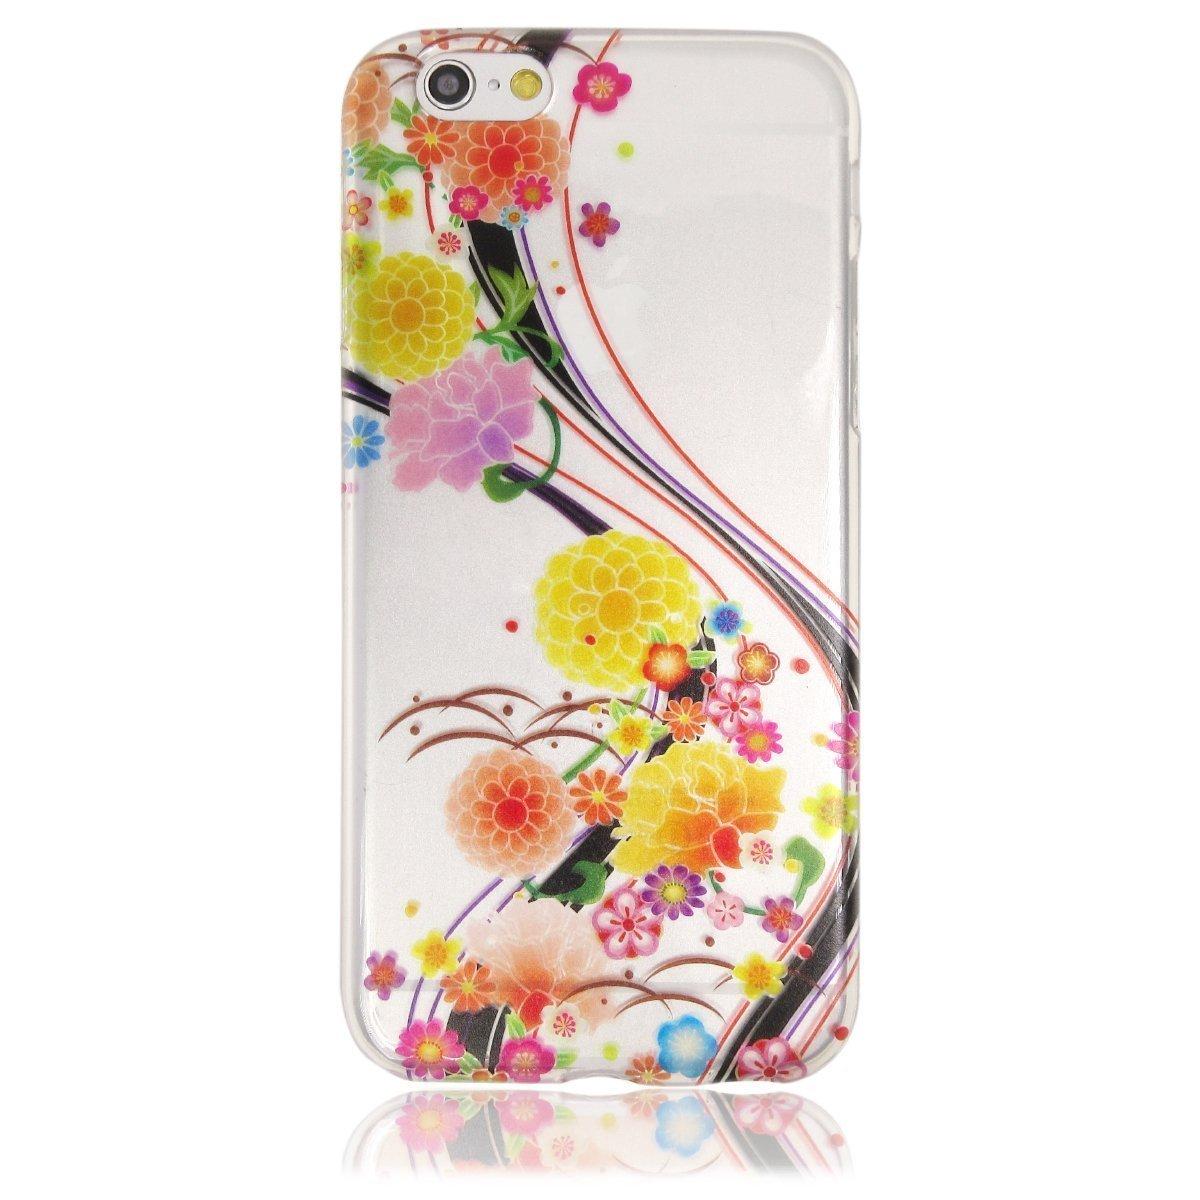 HawkEye IPhone6 Plus /6 jalpanese style ukiyo - E của iPhone vỏ bọc ở Nhật Bản chế tạo lõi trong suố